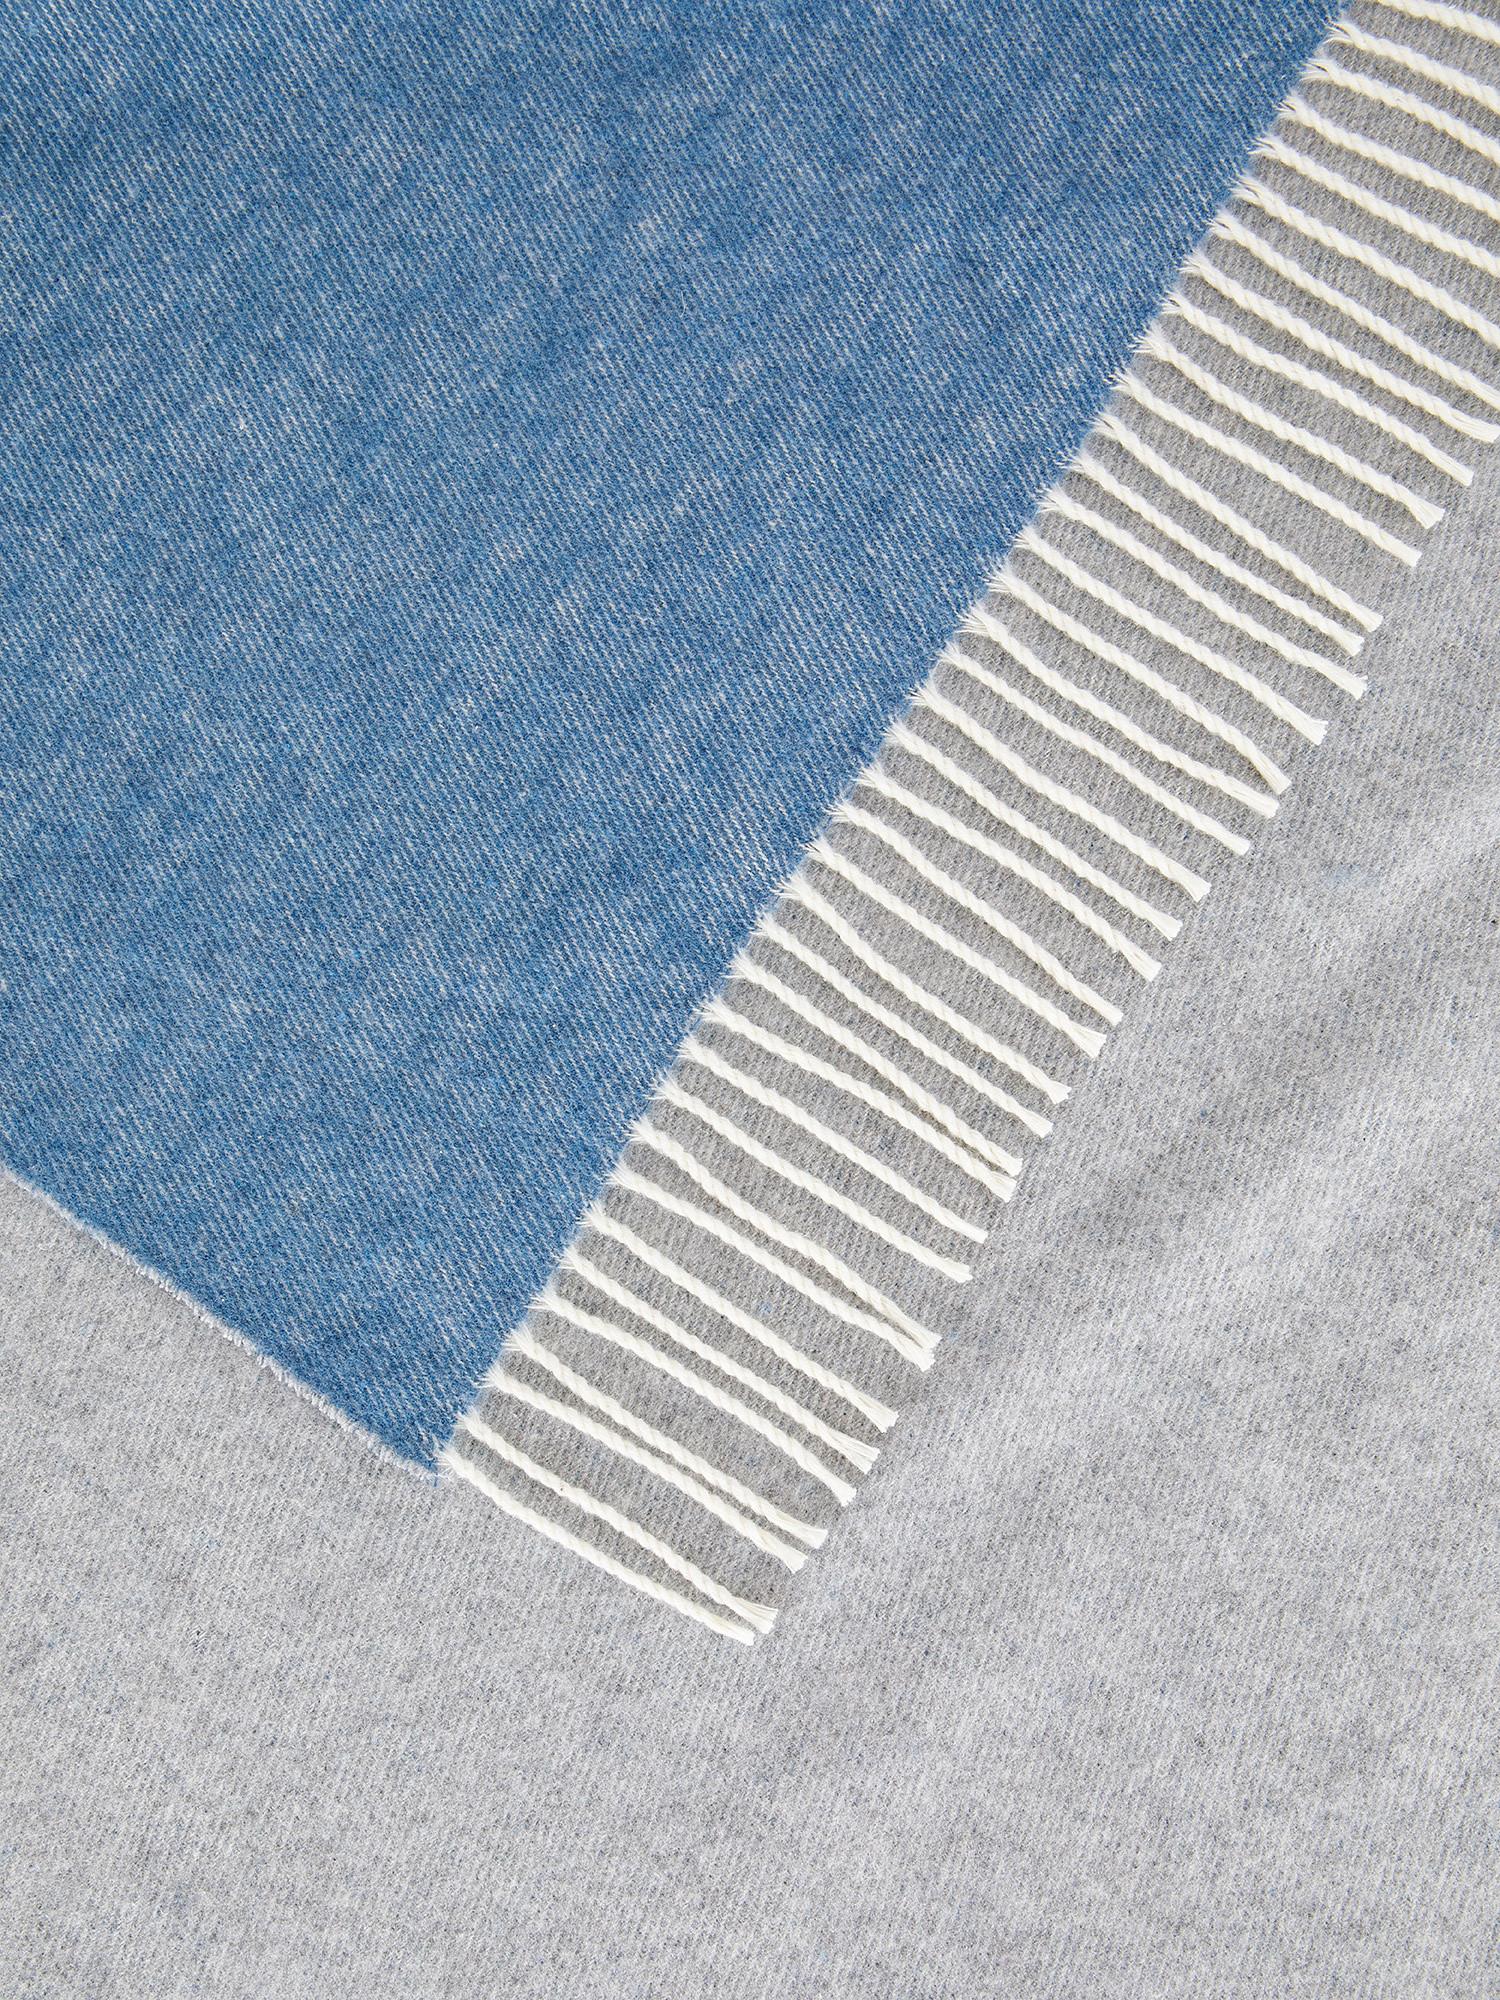 Plaid cotone ecologico double-face, Azzurro, large image number 1